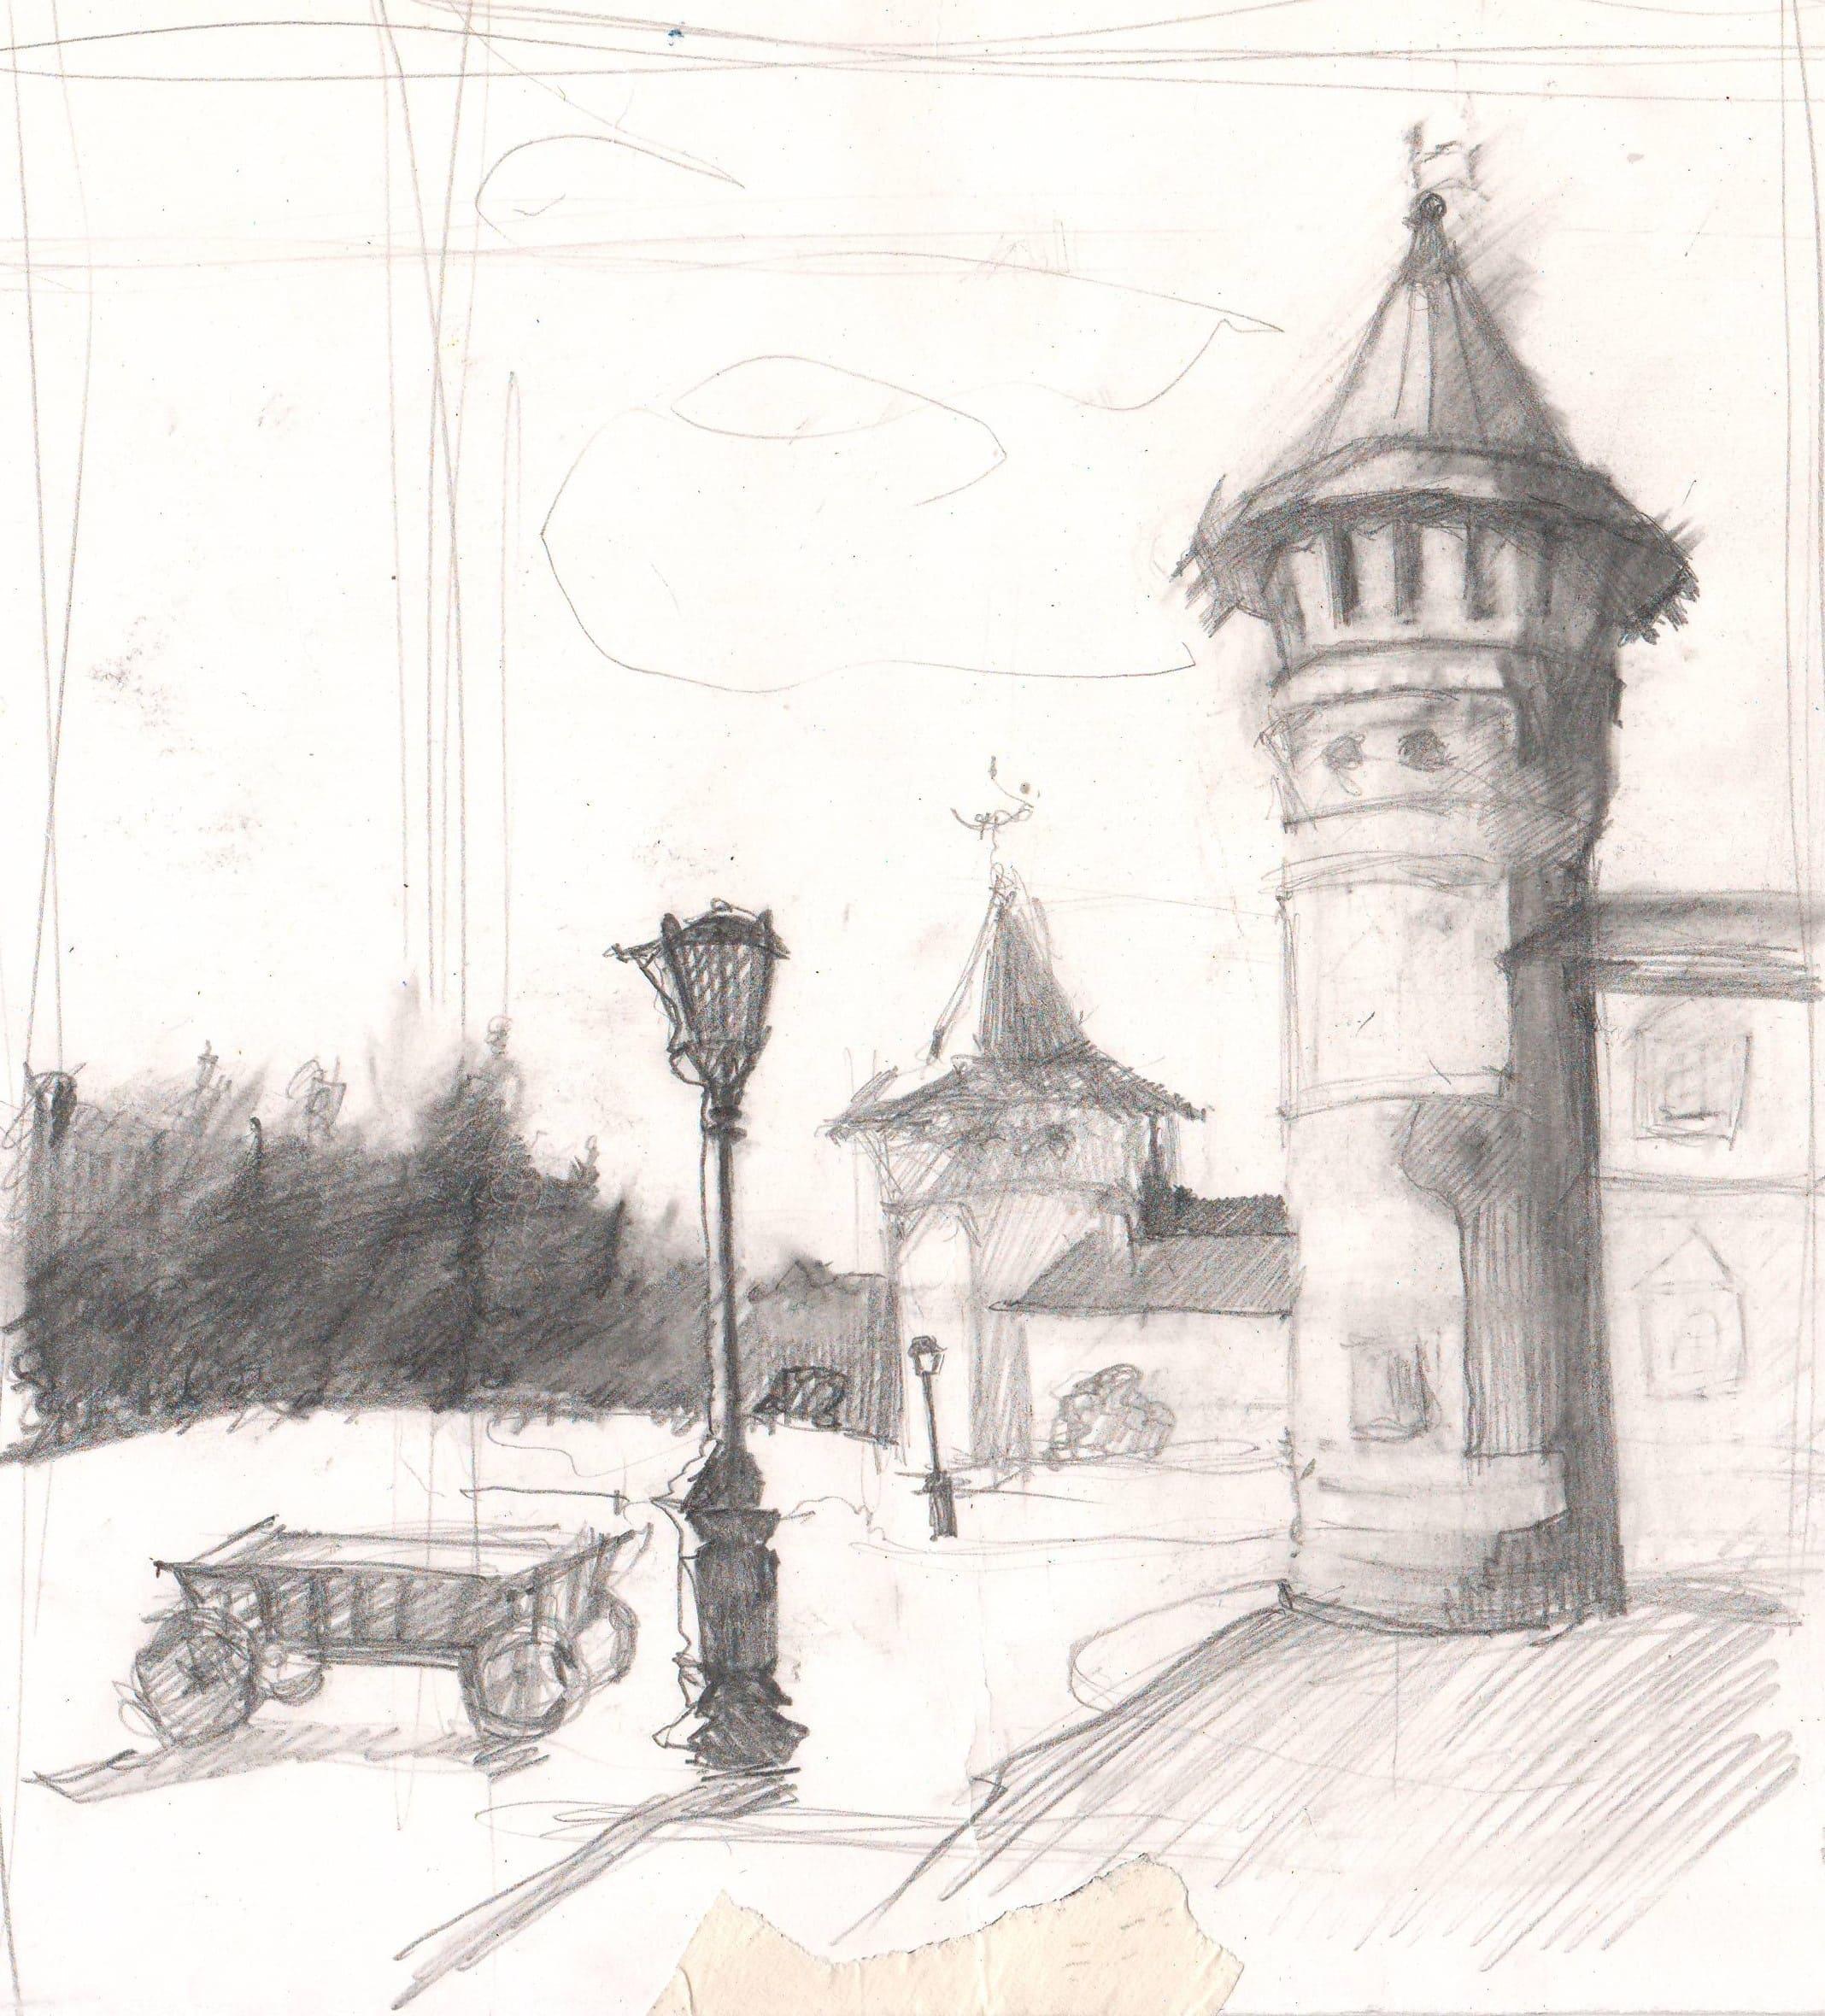 Айимухаметова Алина, серия работ